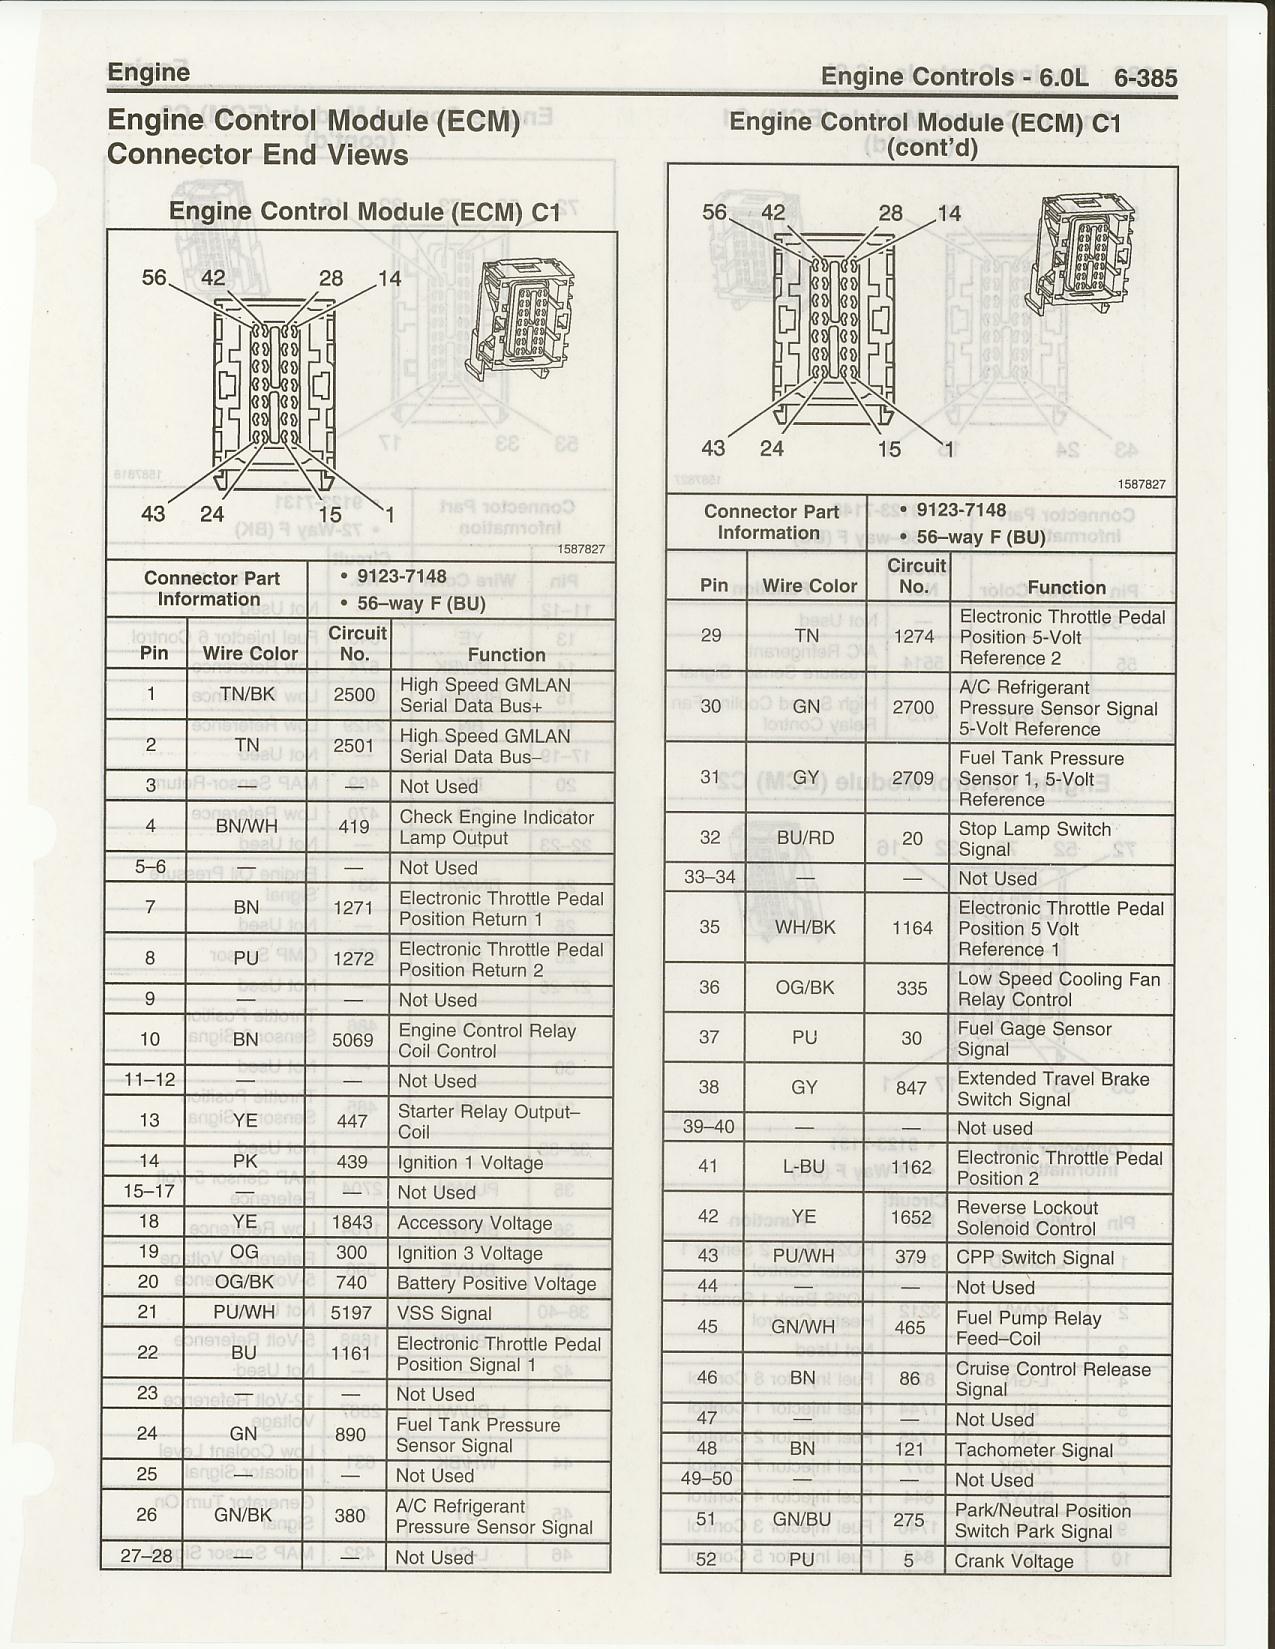 enginecontrols07?resize\\\\\\\\\\\\\\\\\\\\\\\\\\\\\\\=665%2C860 3038 john deere wiring diagram site www tractorbynet com john  at nearapp.co